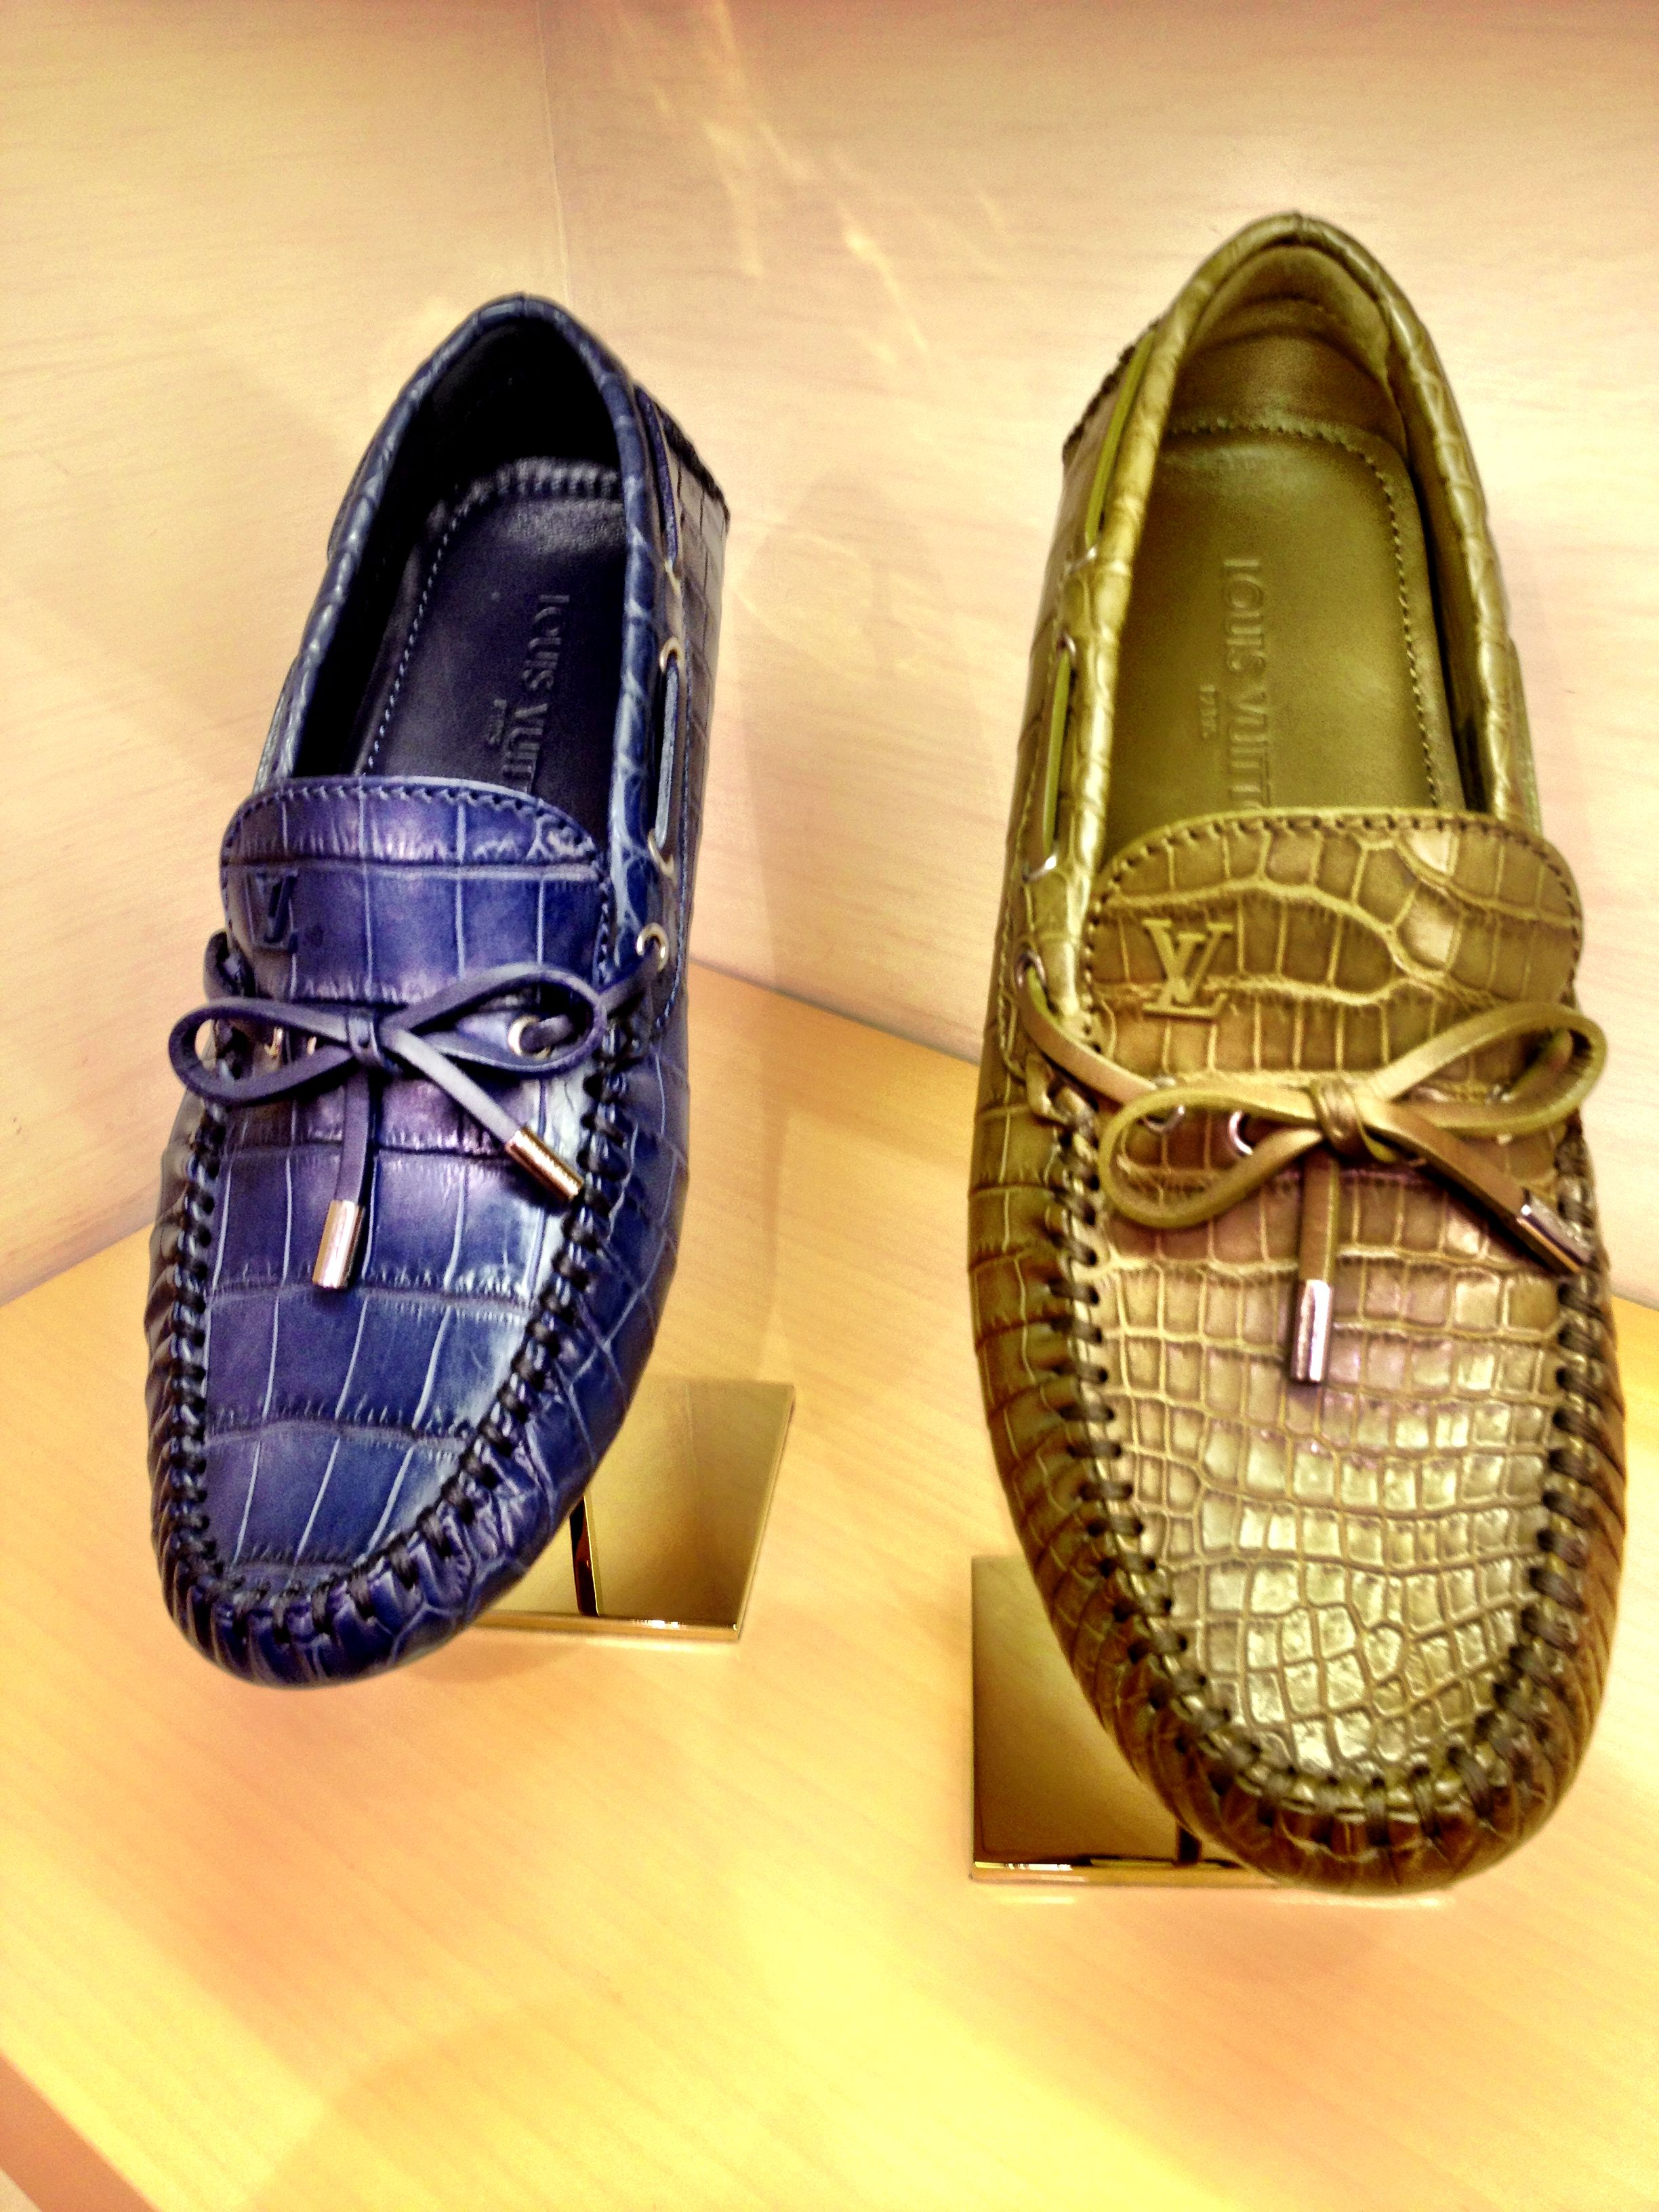 Louis Vuitton alligator loafers